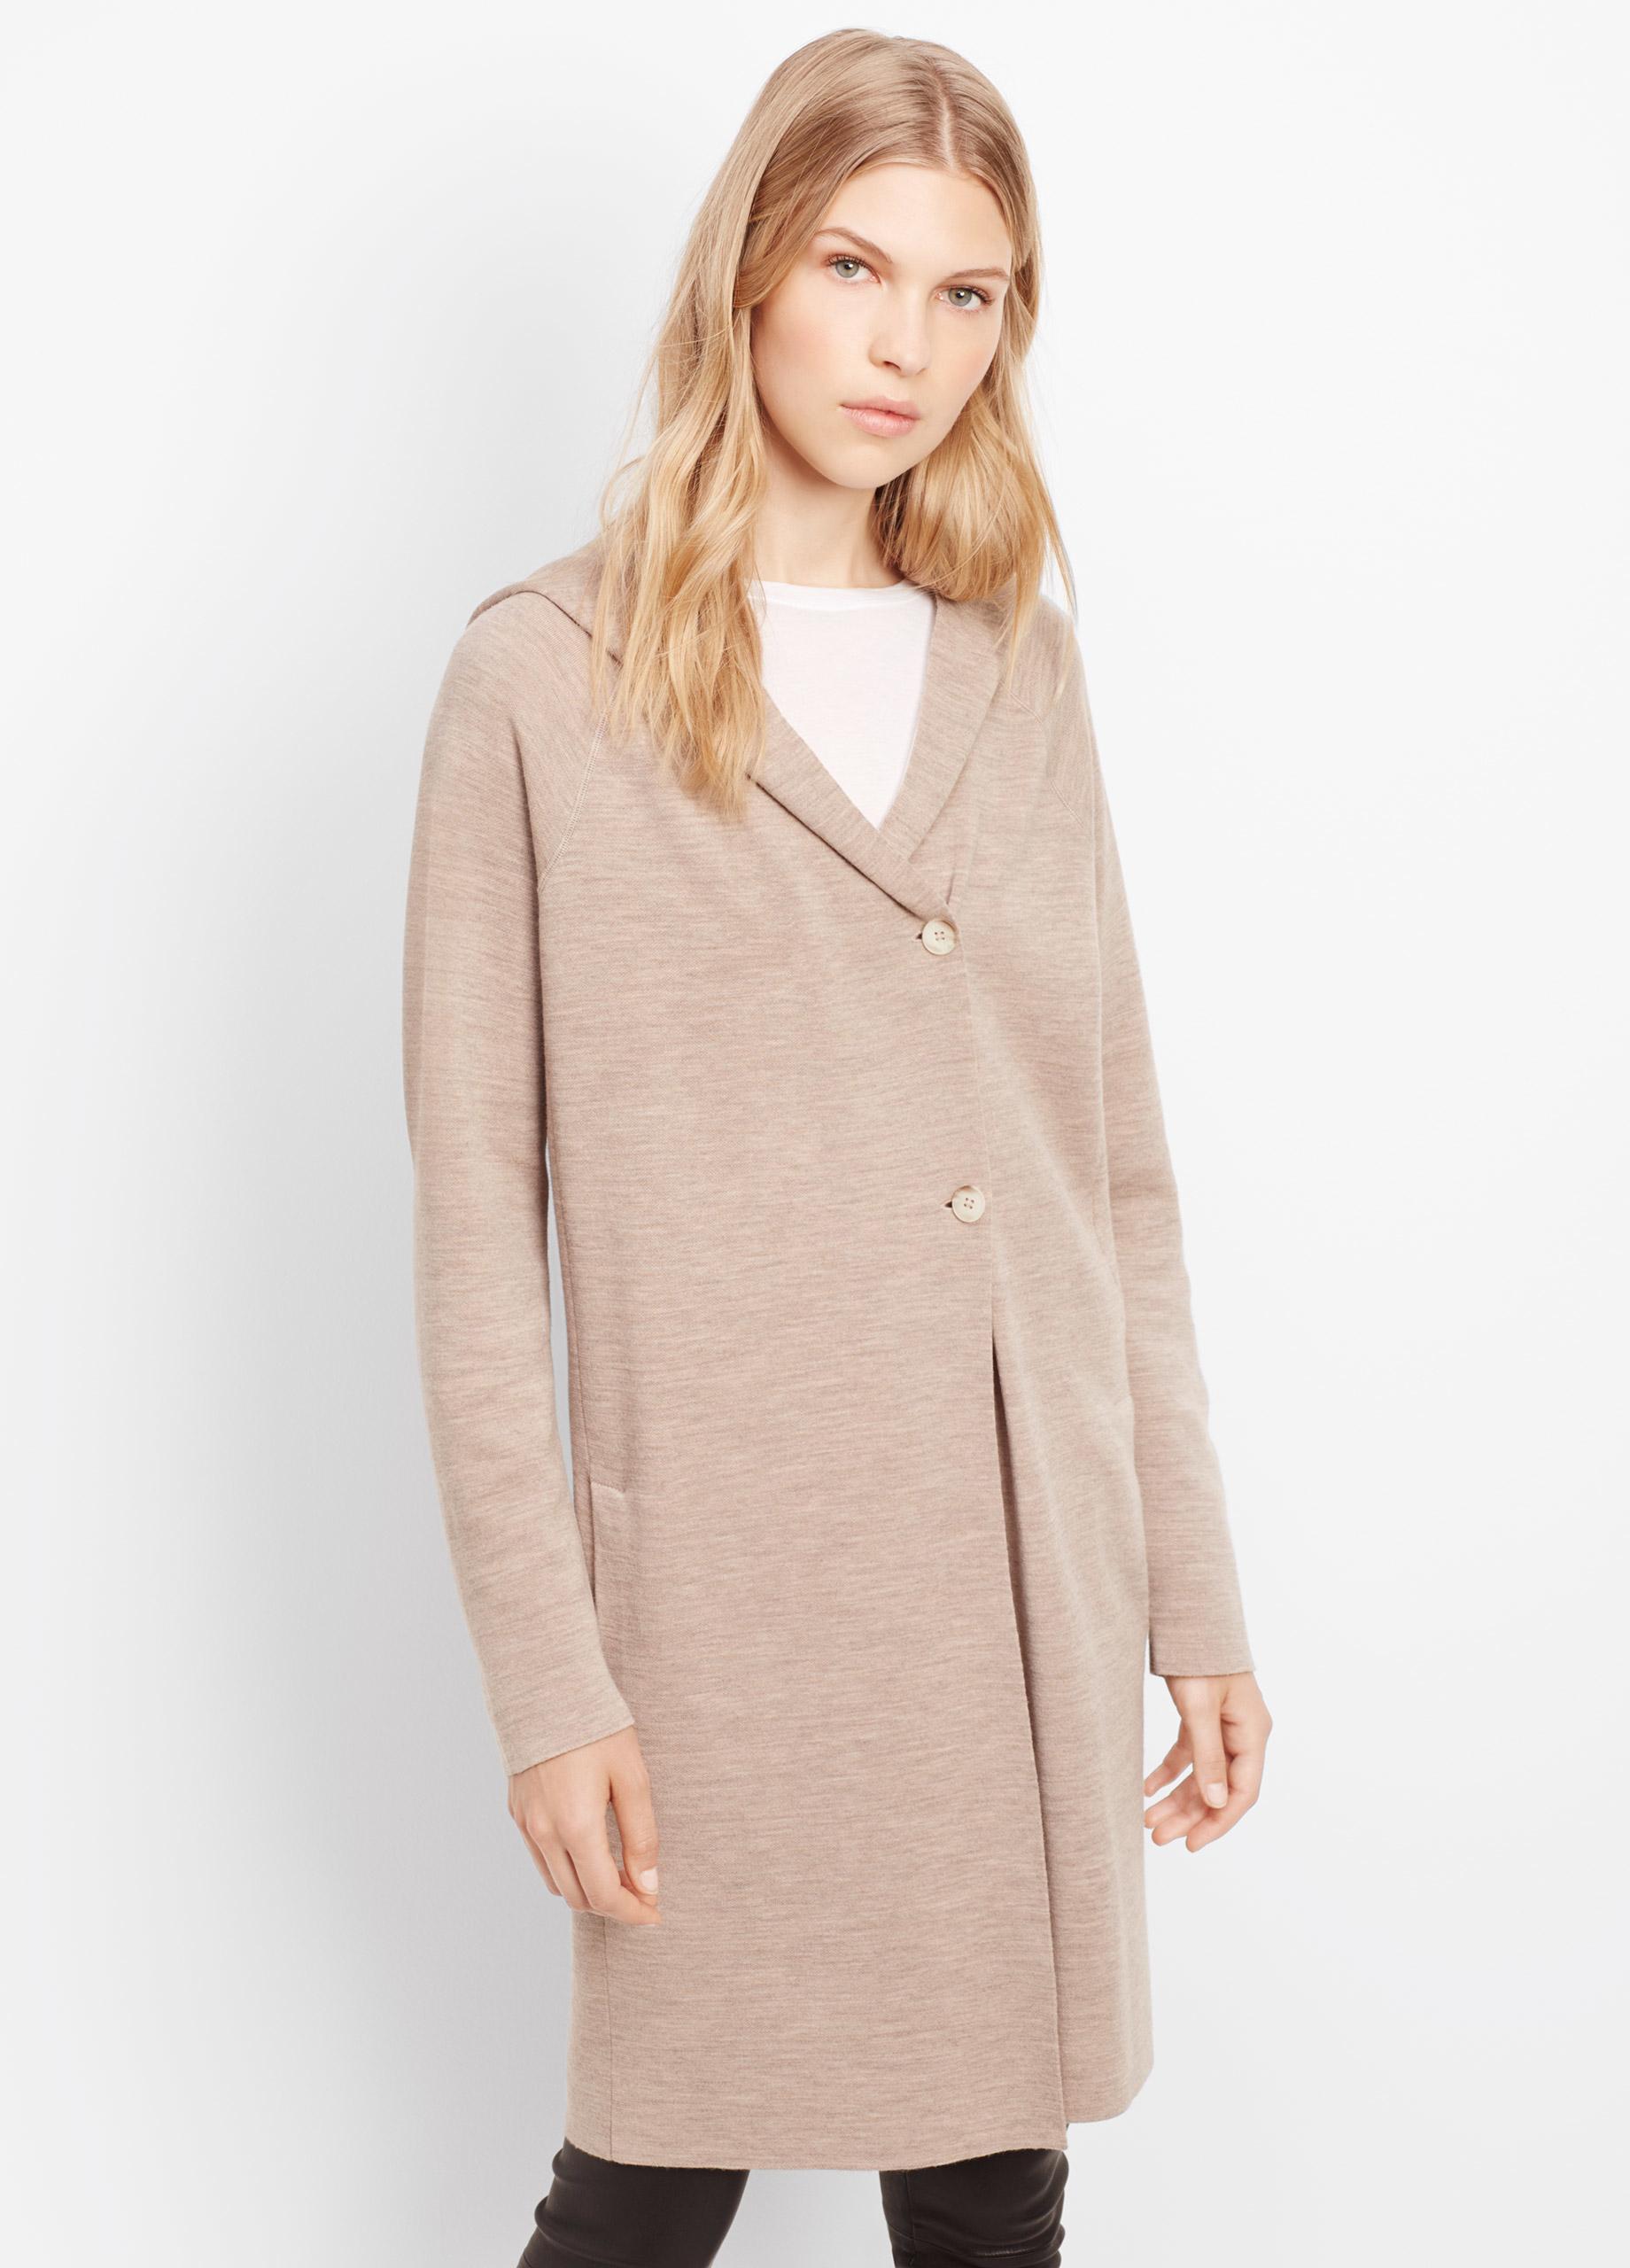 Spandex Sweater